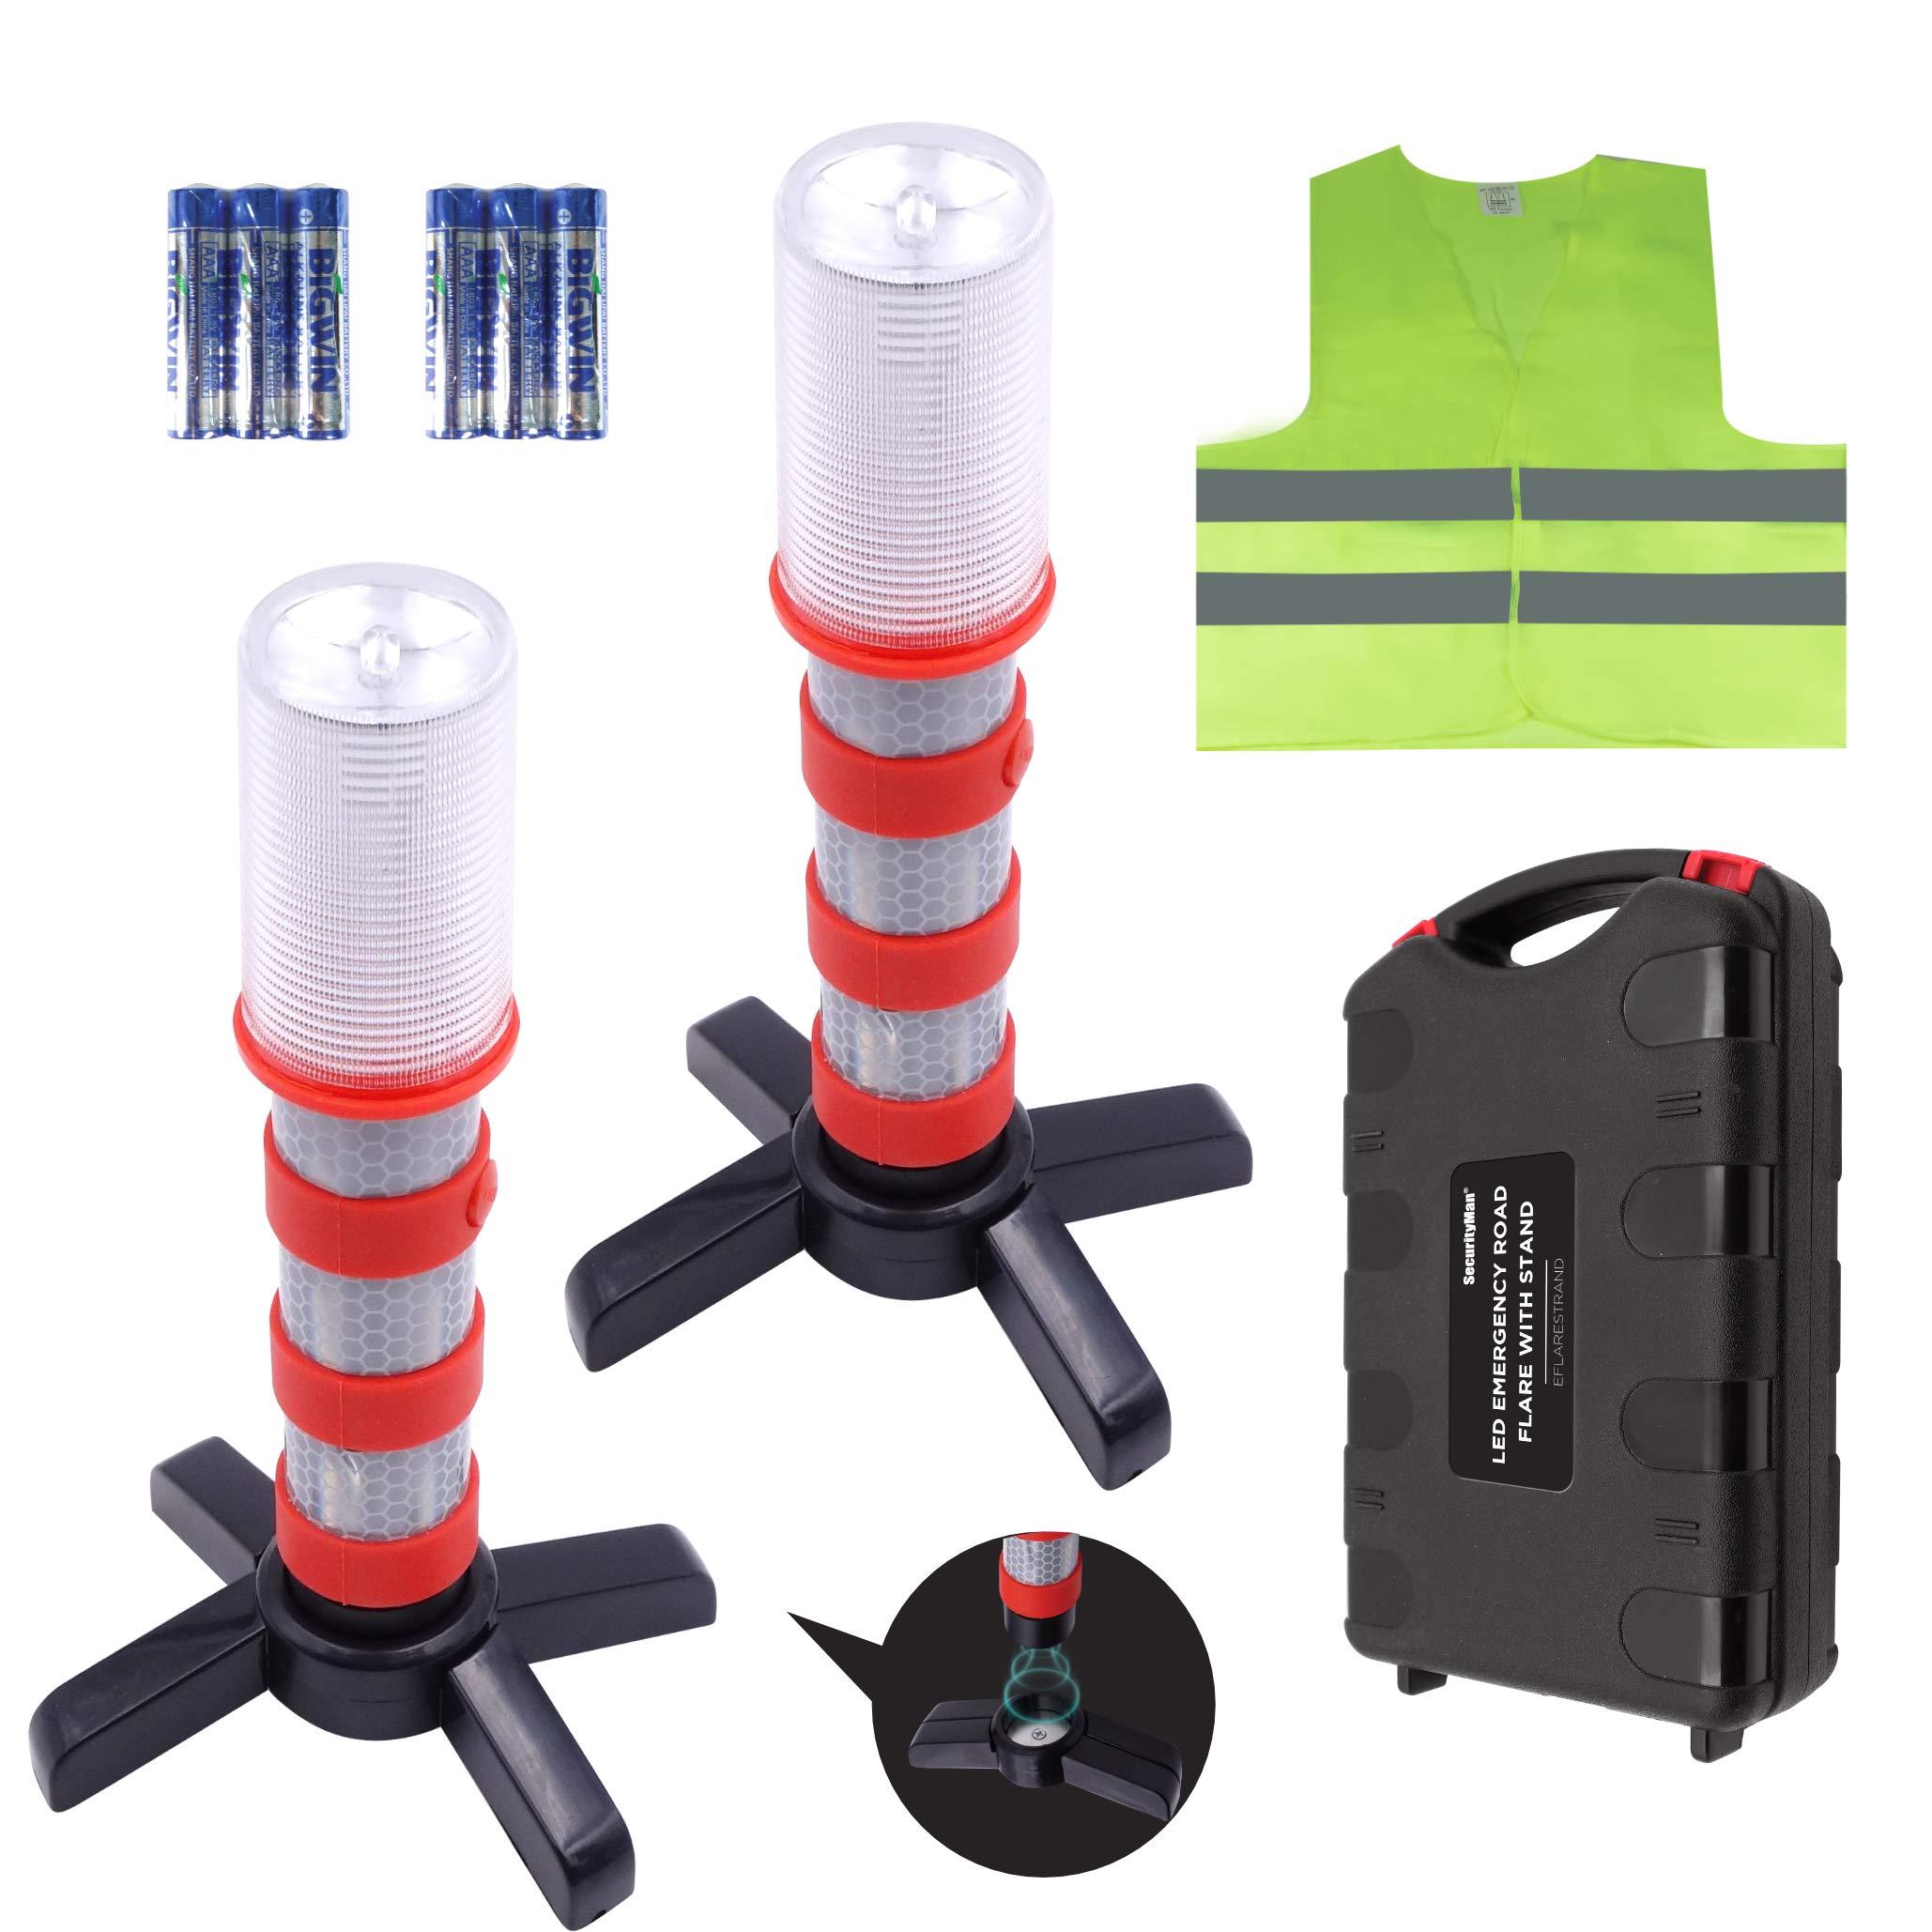 Securityman LED Road Flares (DOT Approved 2 Pack) for Roadside Emergency & Hazard Light Kit for Warning Traffic | Magnetic Base, Waterproof Case, Safety Vest for Cars and Trucks